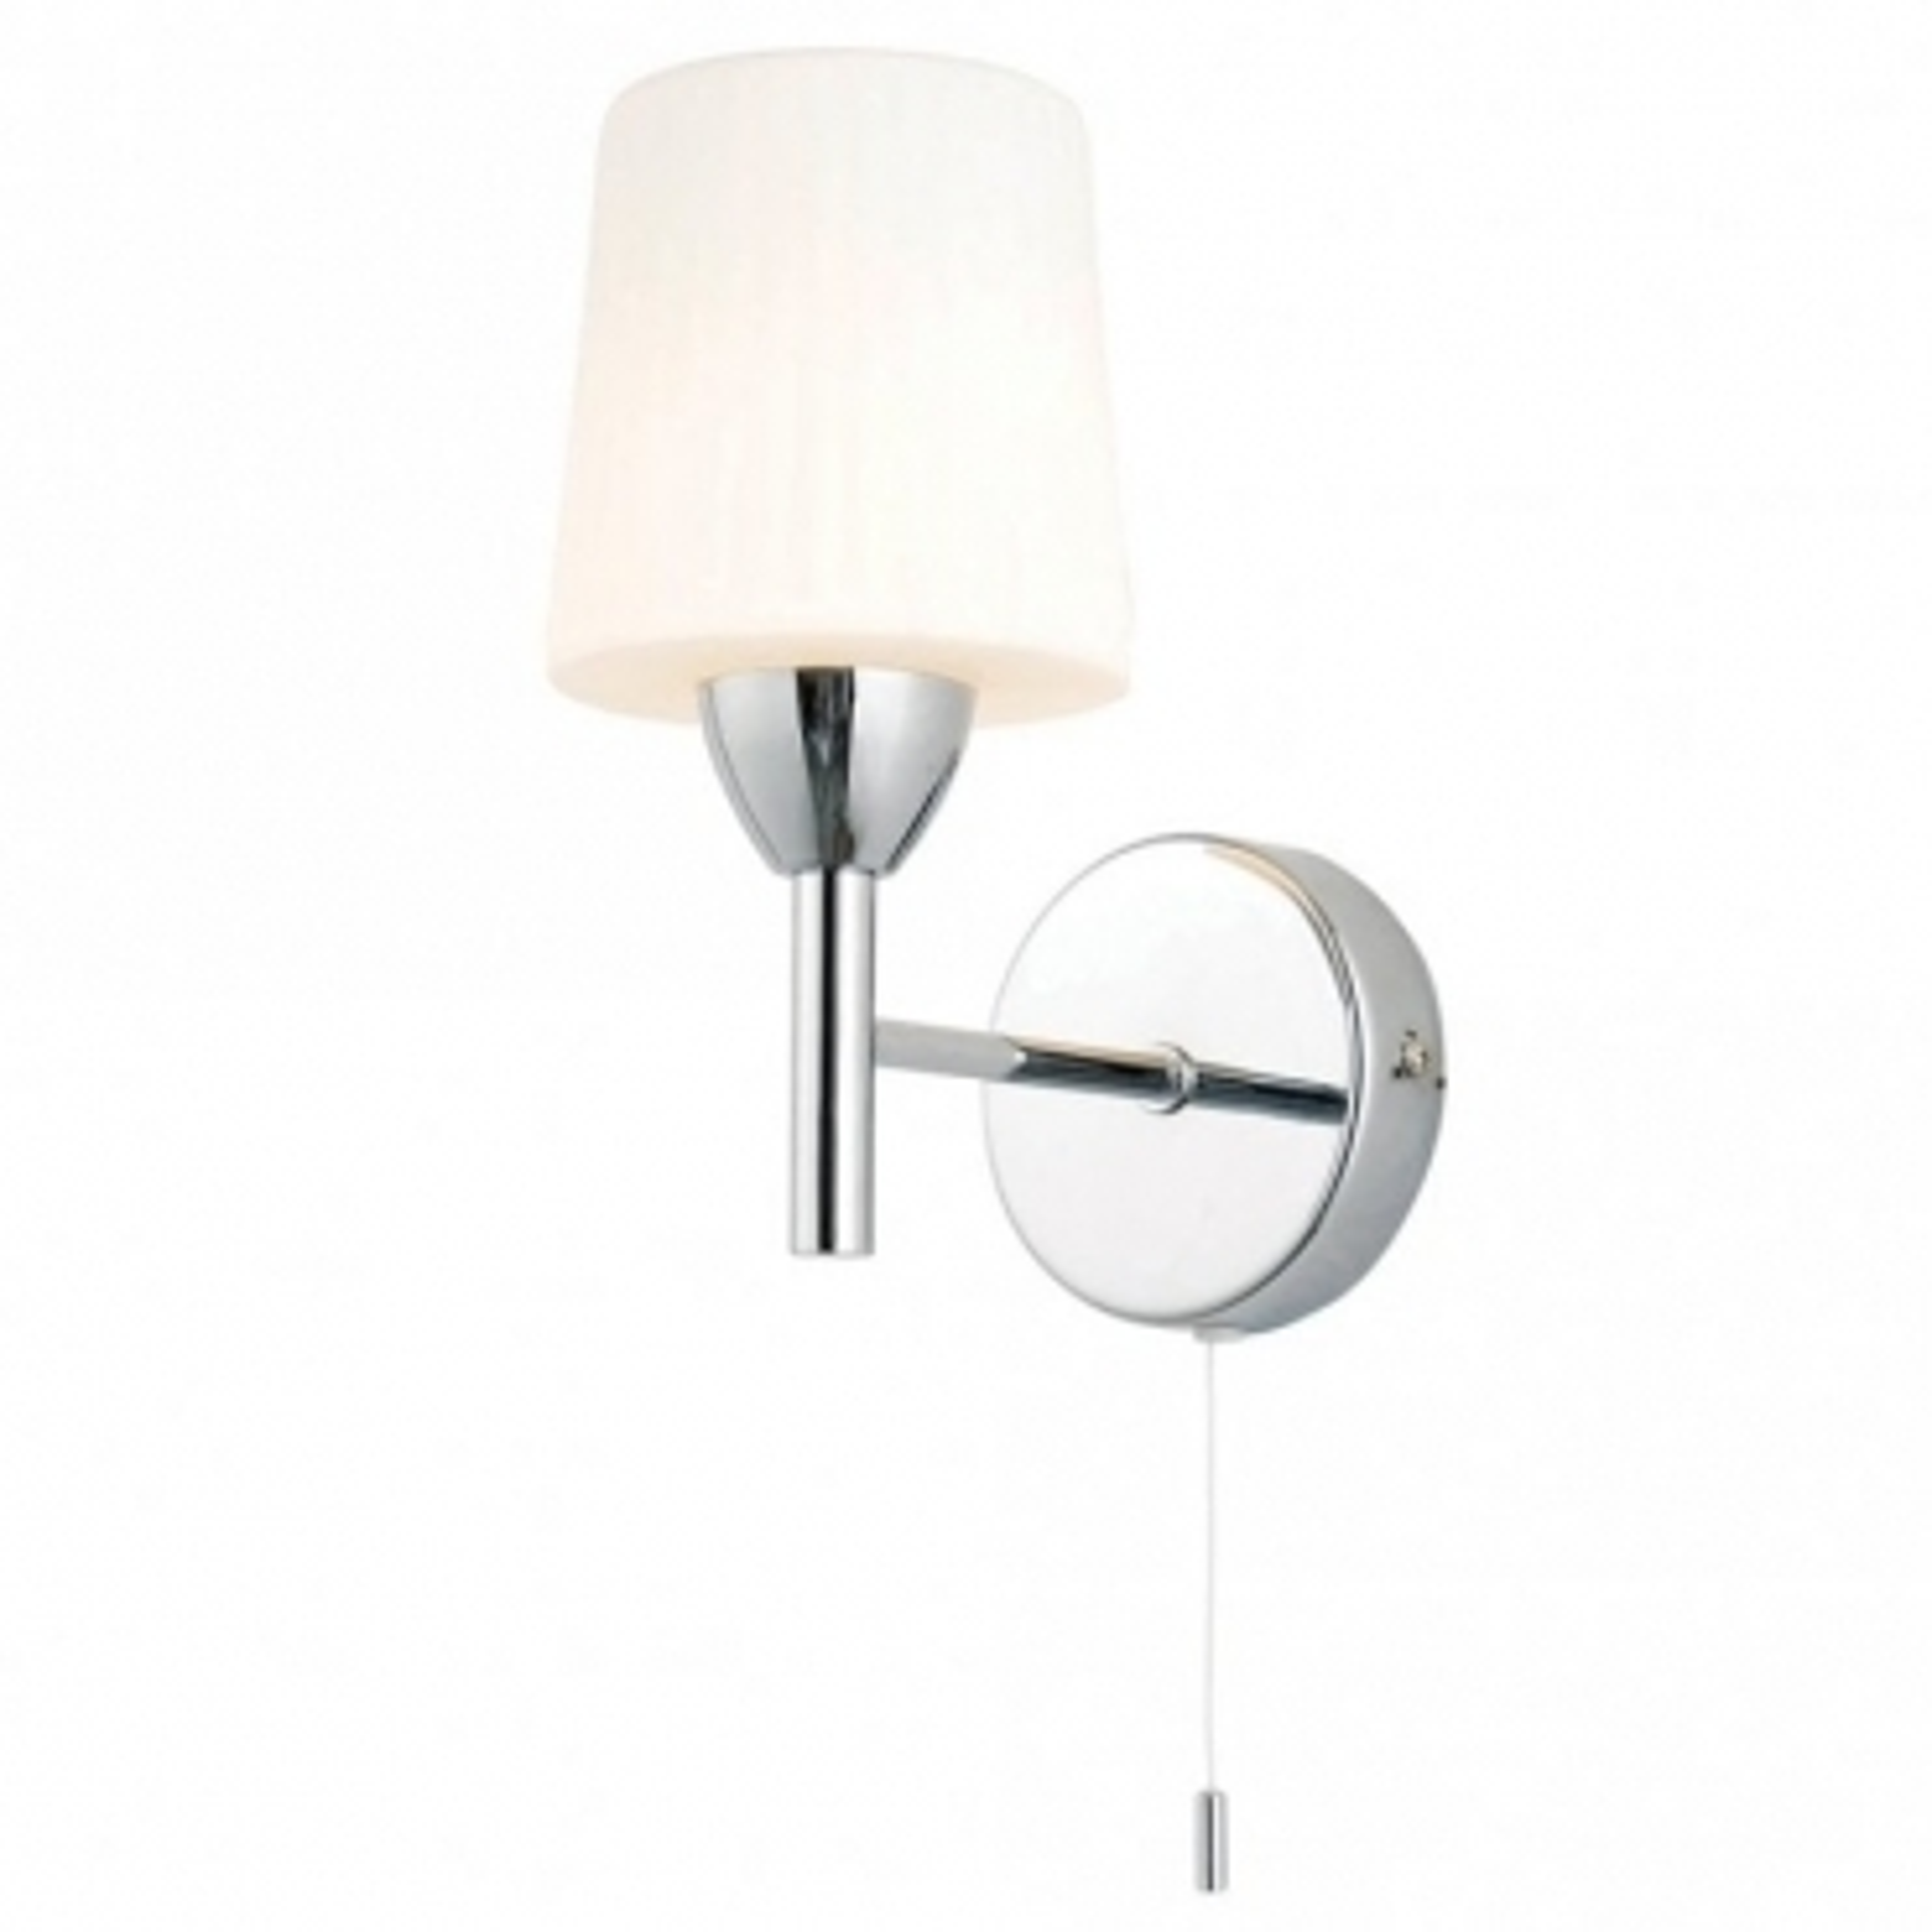 Spa Bathroom Lighting Tapsuk Online Today